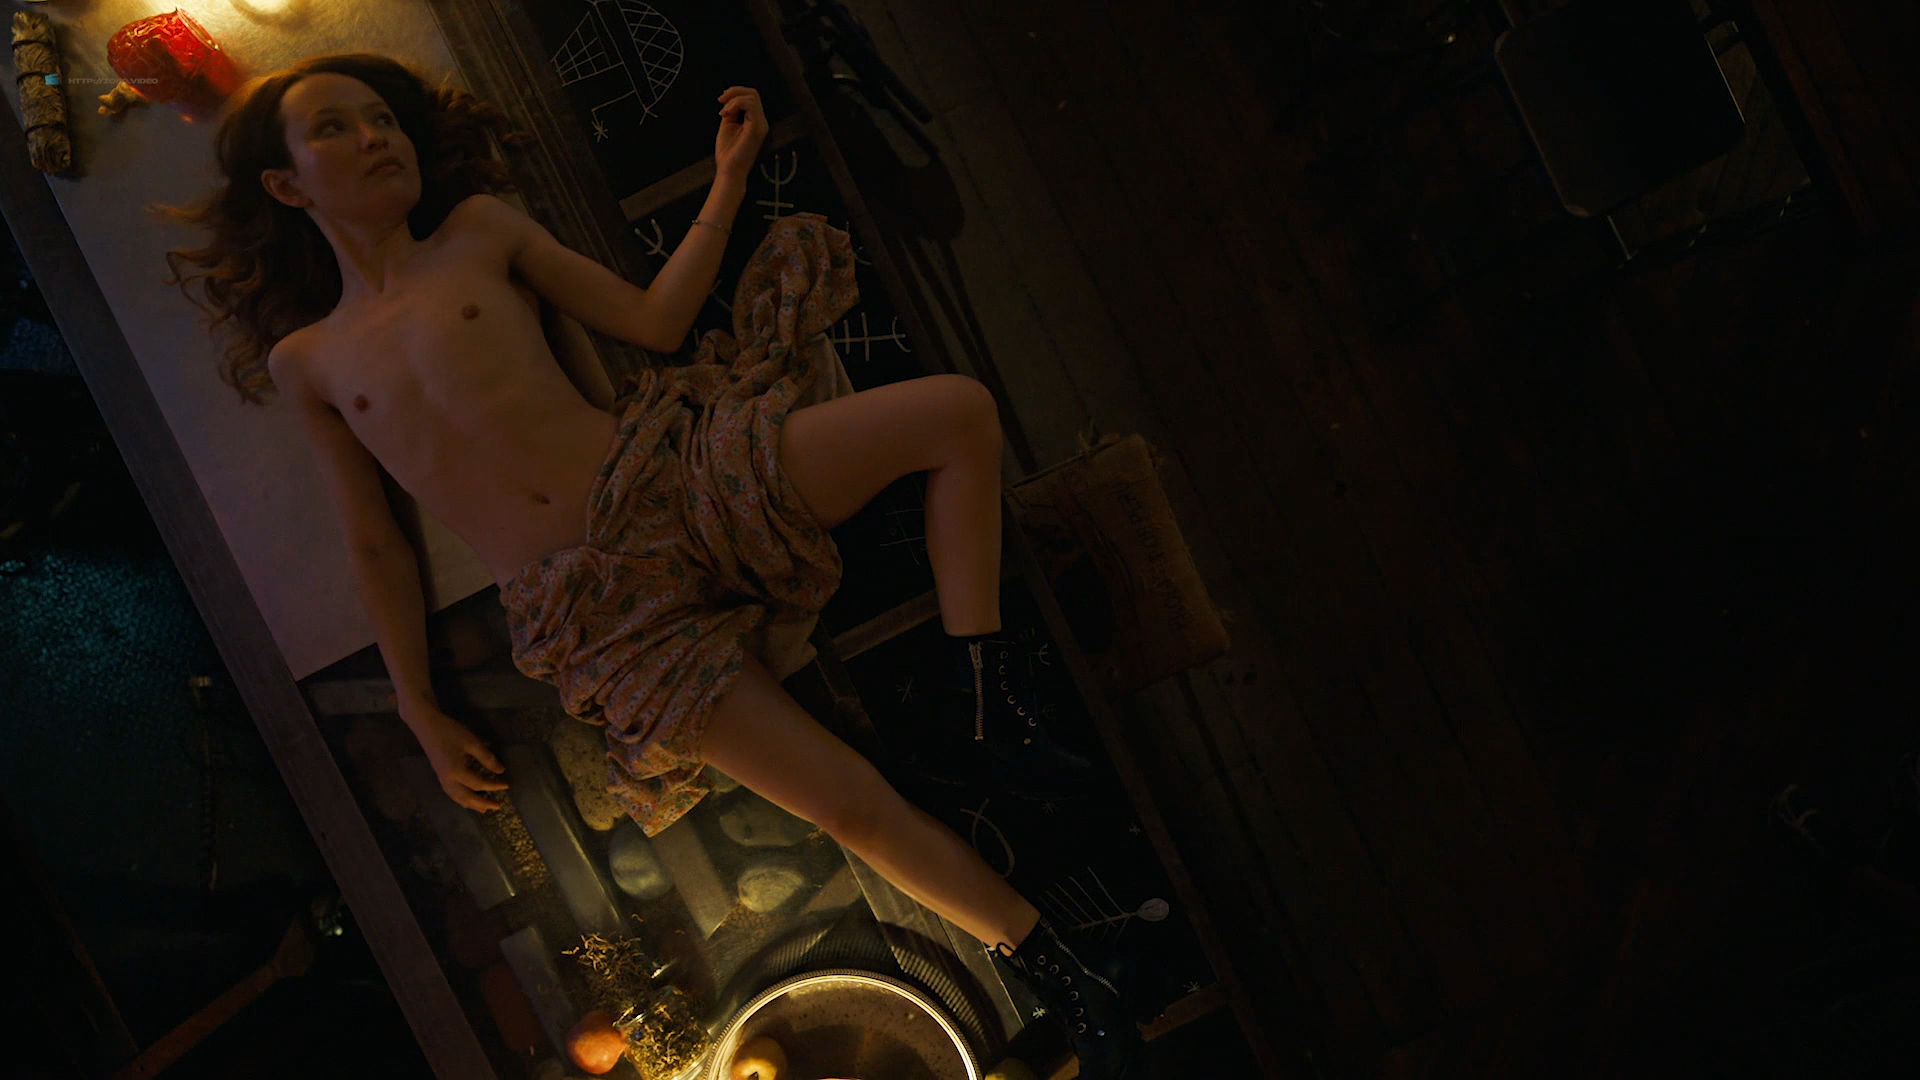 Emily Browning nude hot sex Hani Furstenberg nude sex too - American Gods (2019) s2e5 HD 1080p (3)